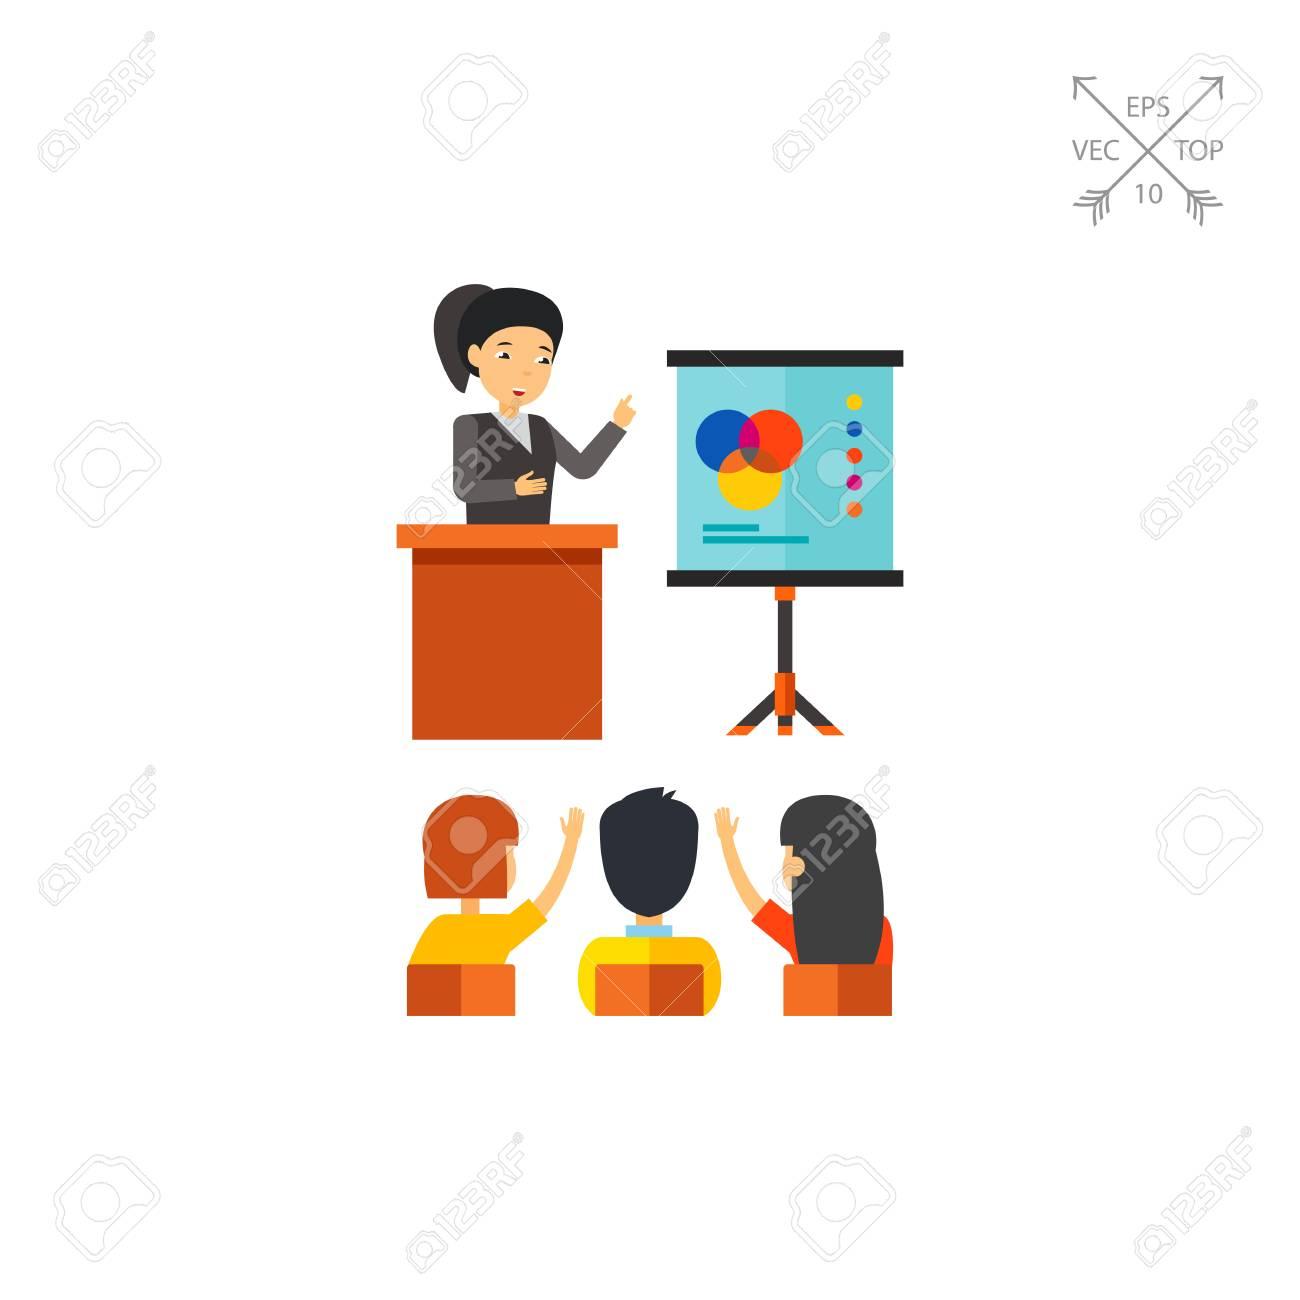 Giving Presentation Clipart